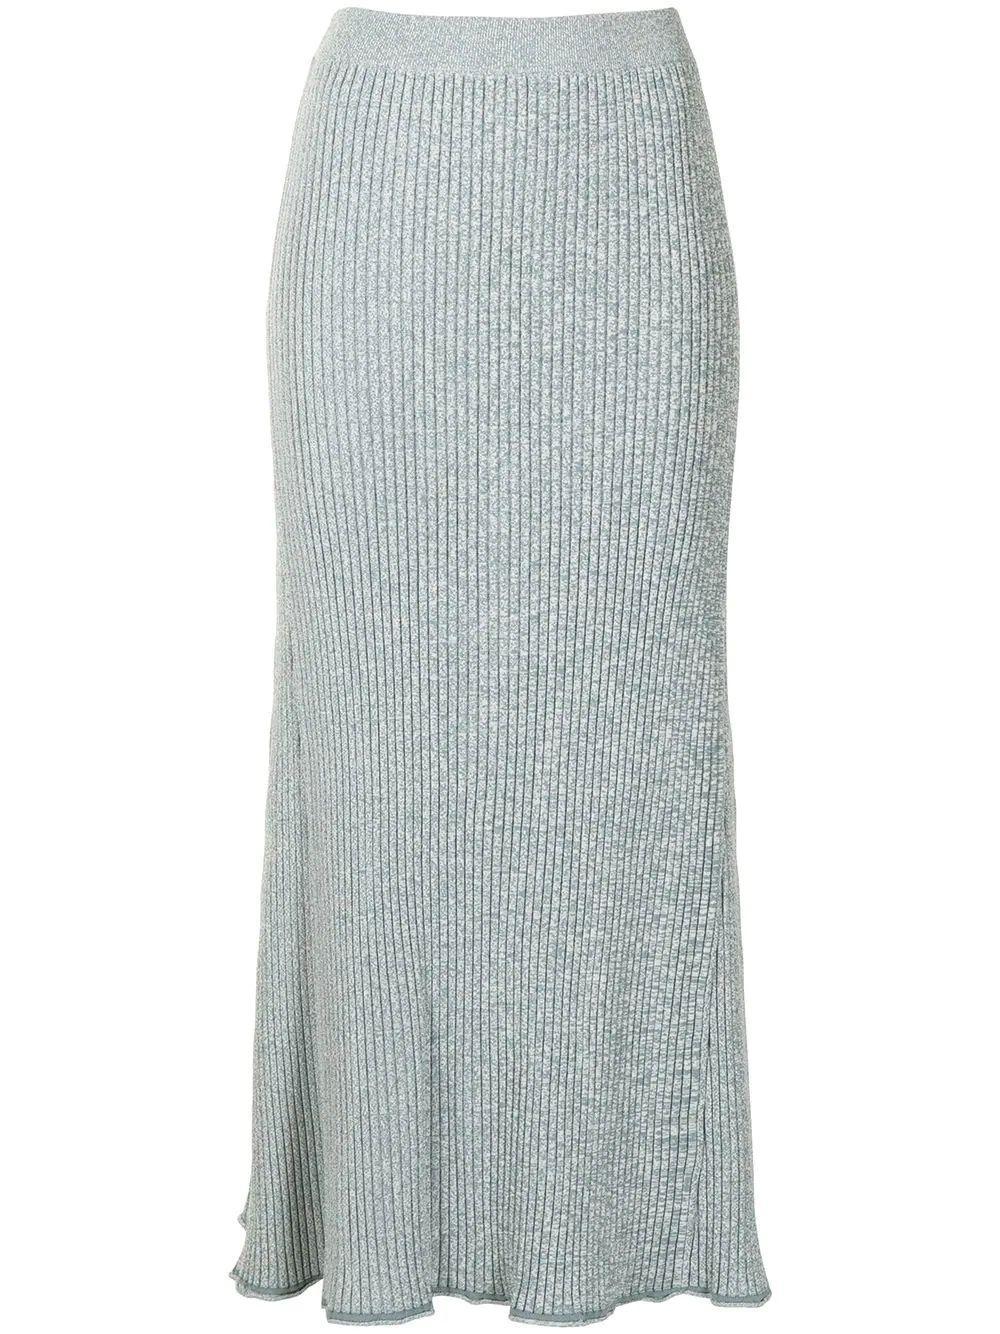 Mouline Midi Skirt Item # L0116717